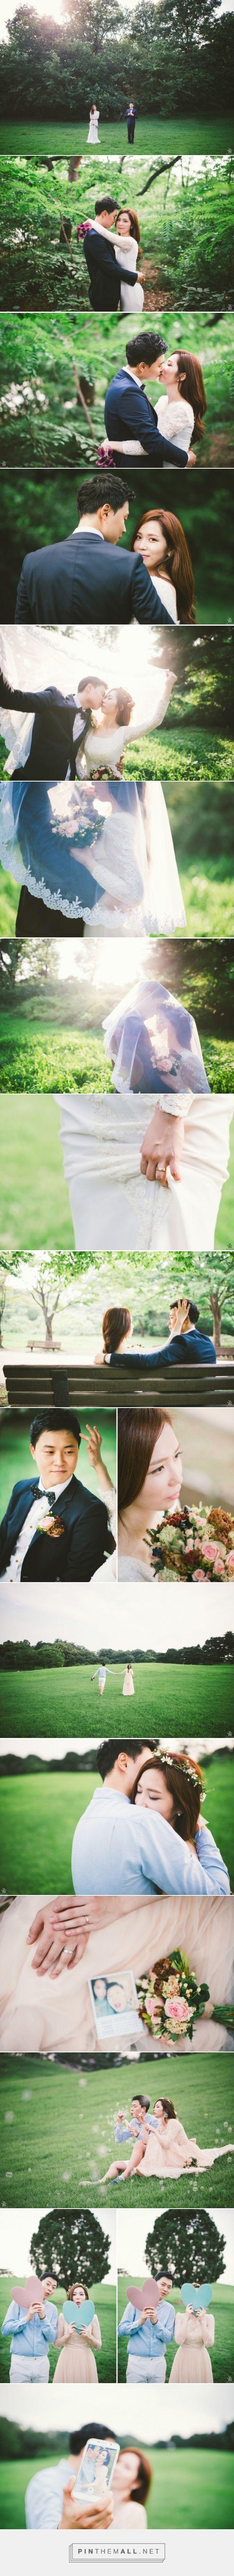 Beach wedding pre shoot  Best  Wedding and Fotoshot ideas on Pinterest  Bridal pictures